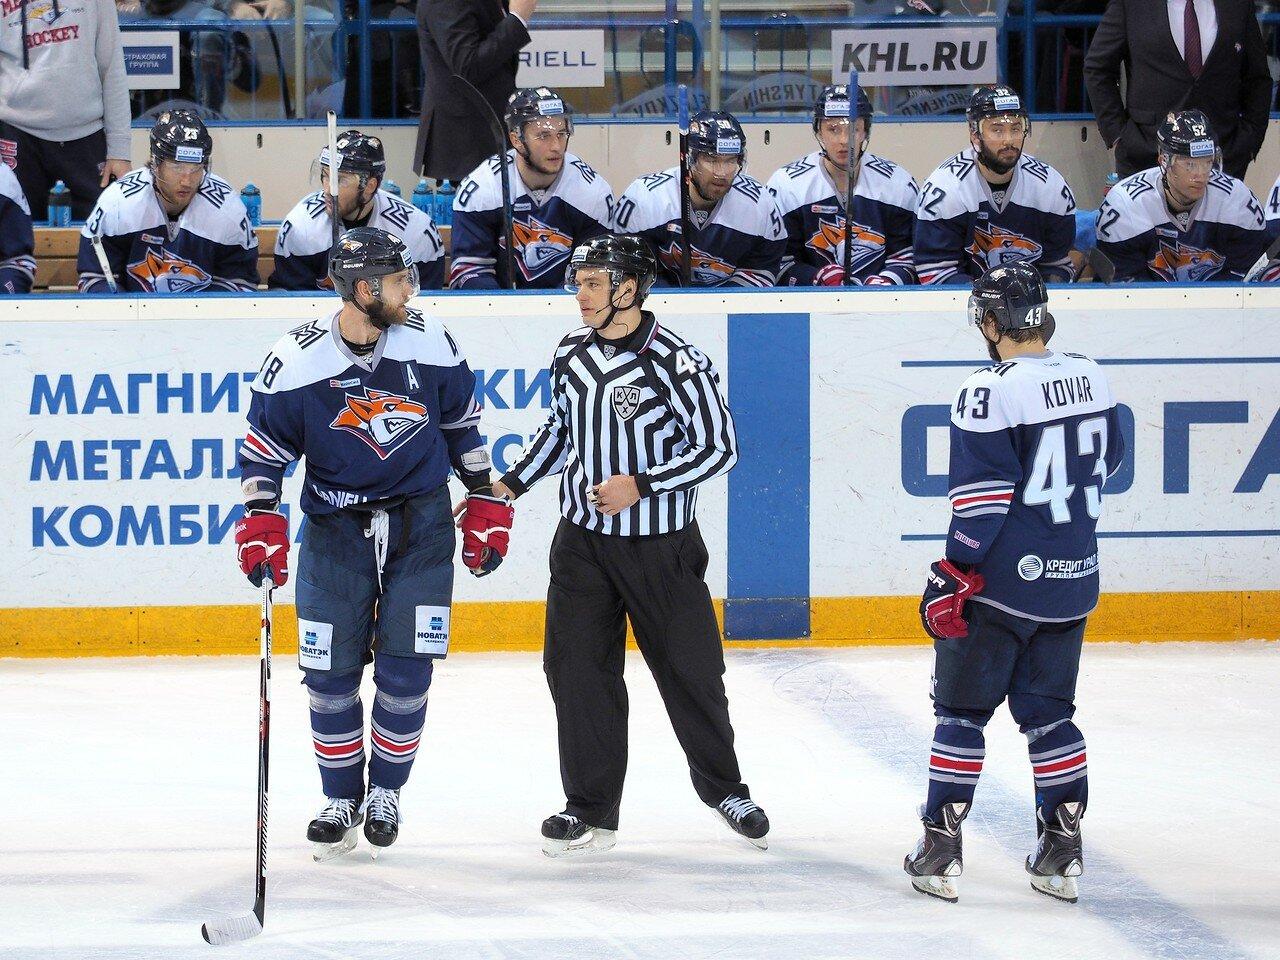 72Плей-офф 2016 Восток Финал Металлург - Салават Юлаев 31.03.2016